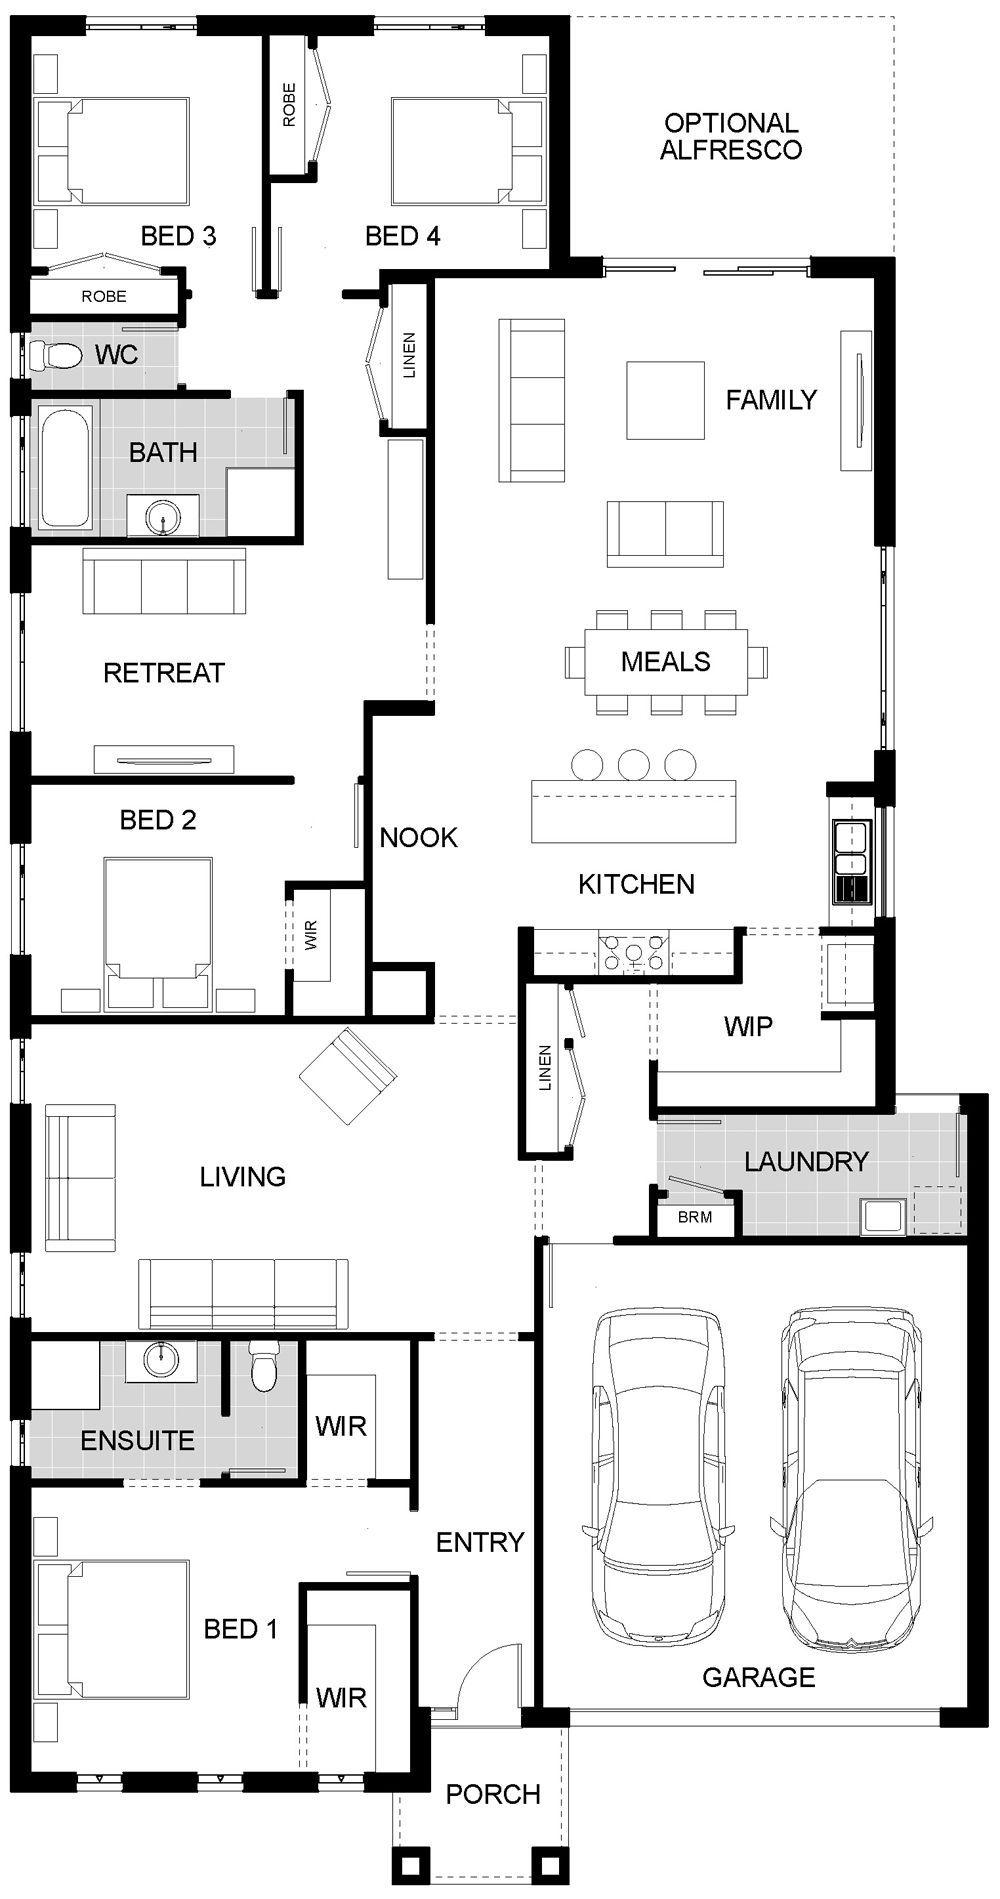 a nice layout austin 1 dream home pinterest dream house rh pinterest com